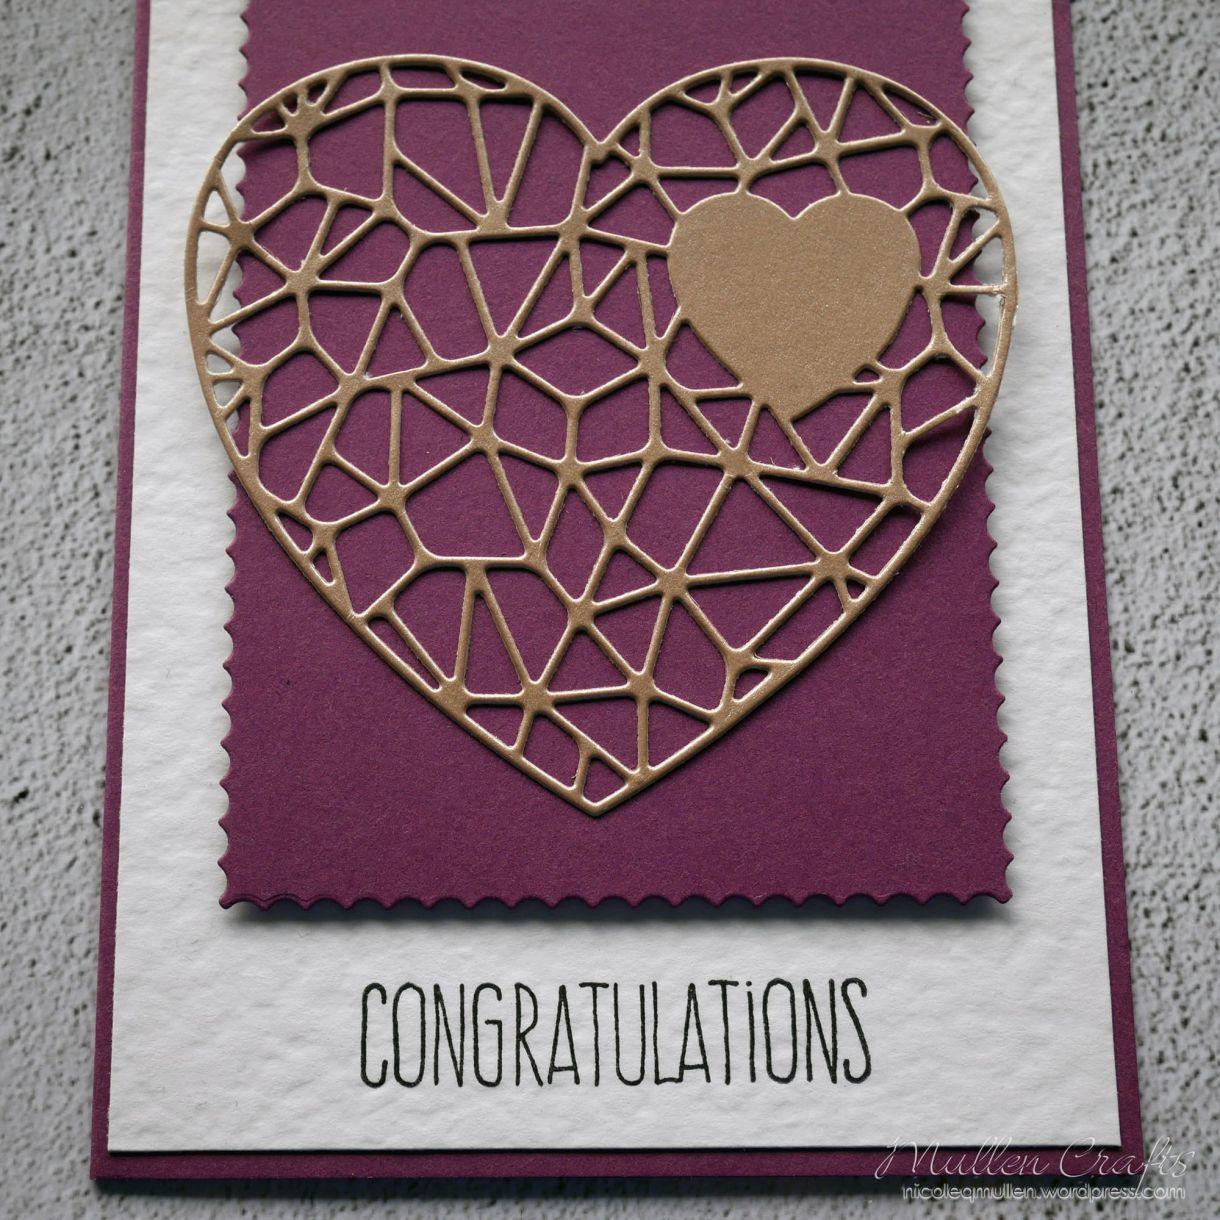 Pirple Heart Congrats 2